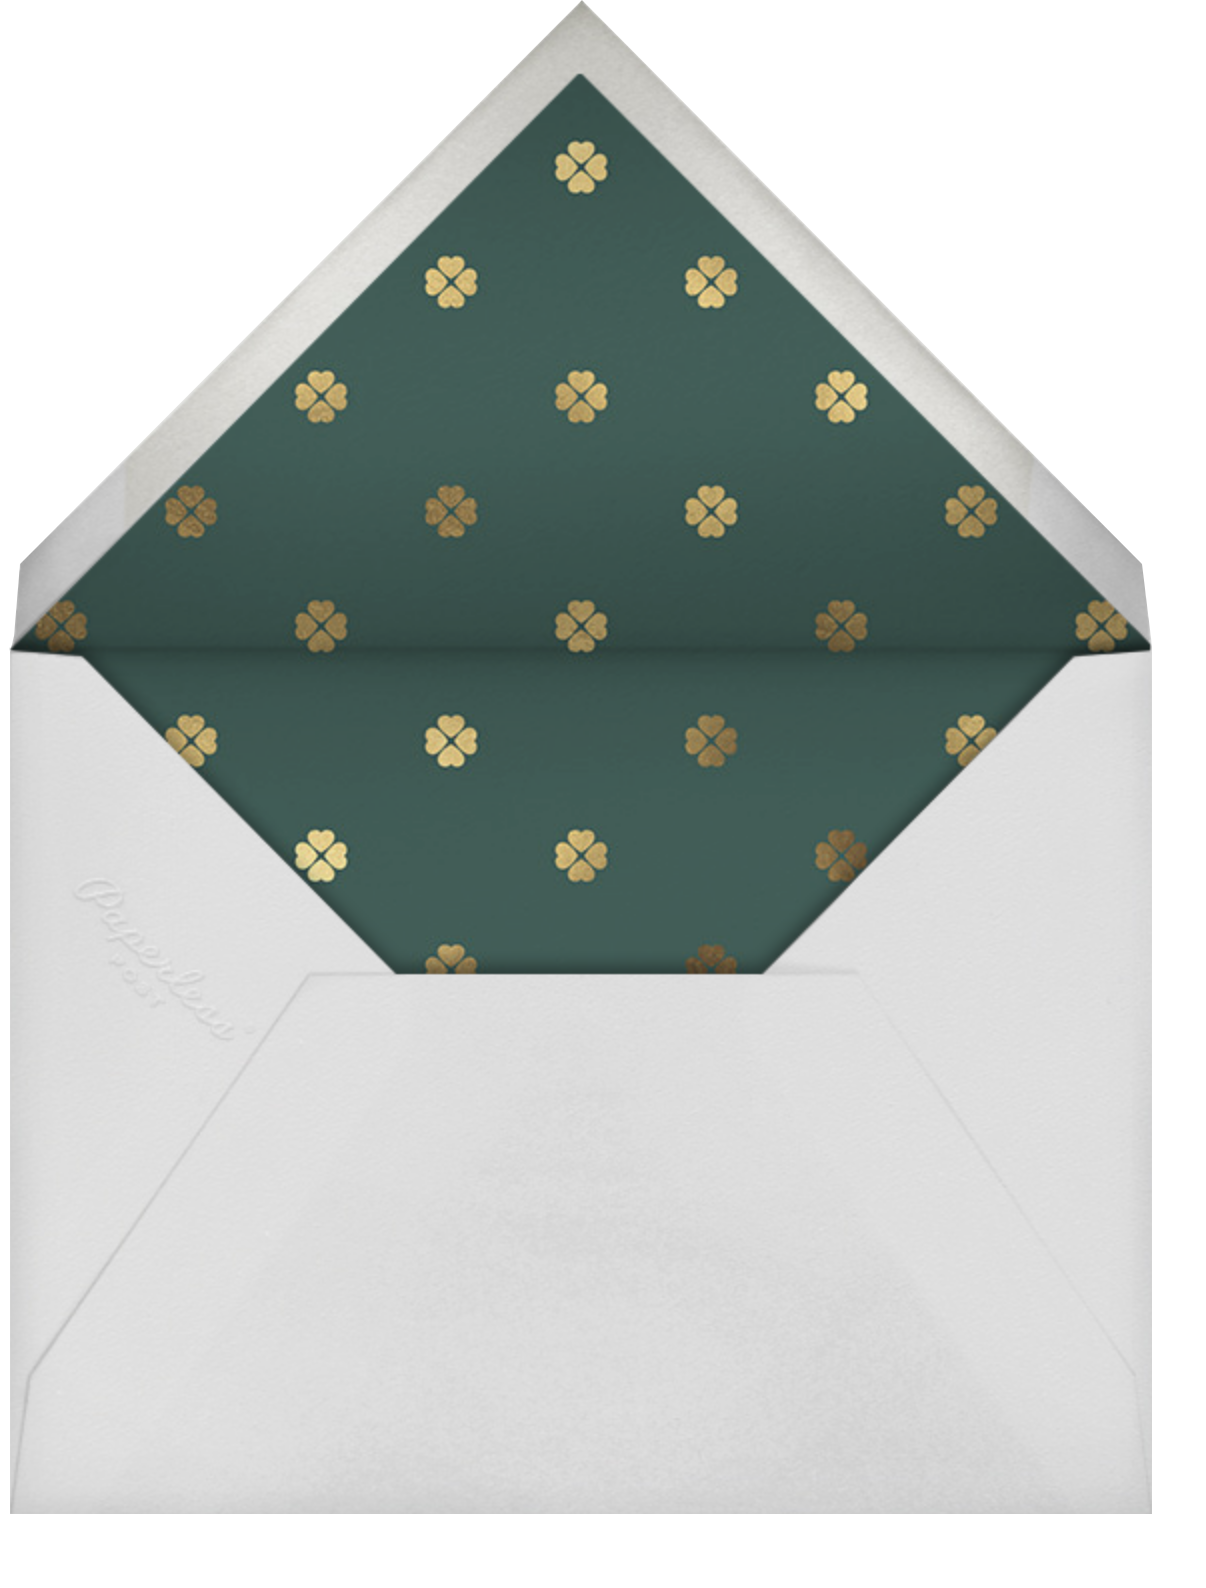 Colorblocked Stripes - Spruce/Carnation - kate spade new york - Bachelorette party - envelope back